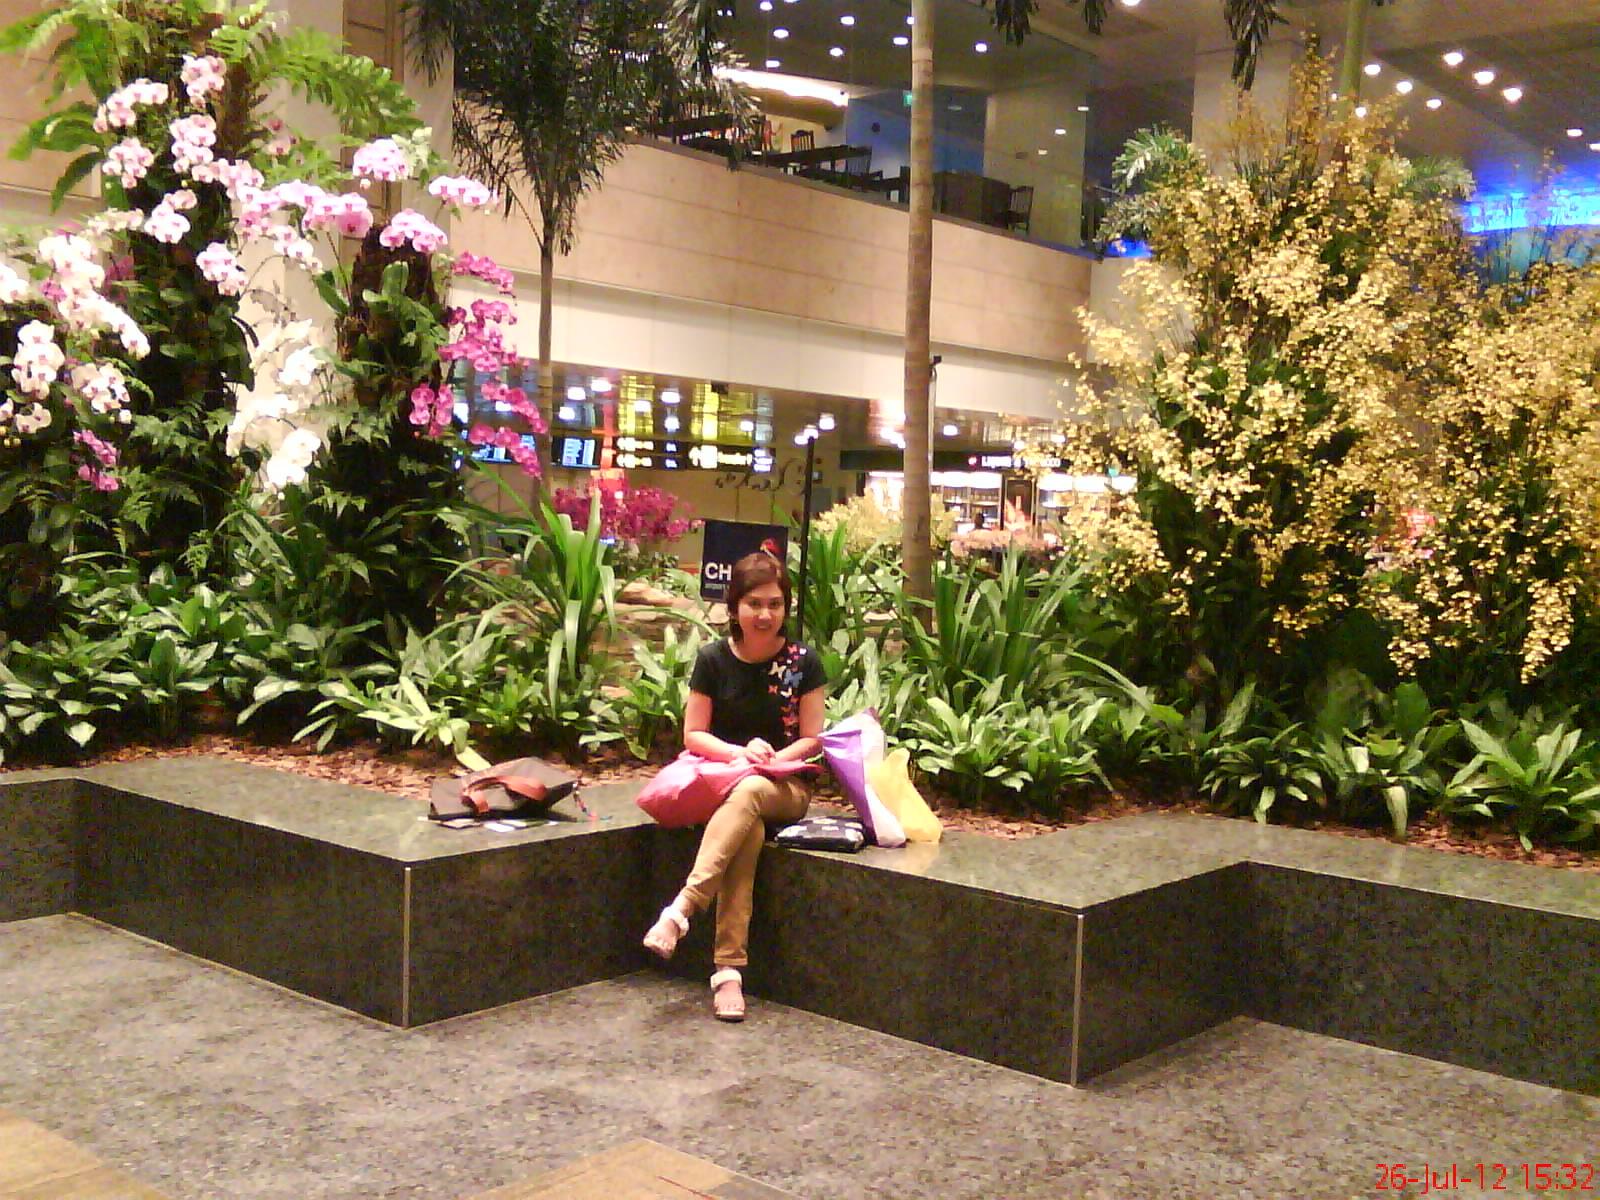 Summer Holiday Singapore Part 1 Bdo Sin Amanda Tomato Tiket Fisik Garden By The Bay Anak Titip Di Hotel Changi Airport